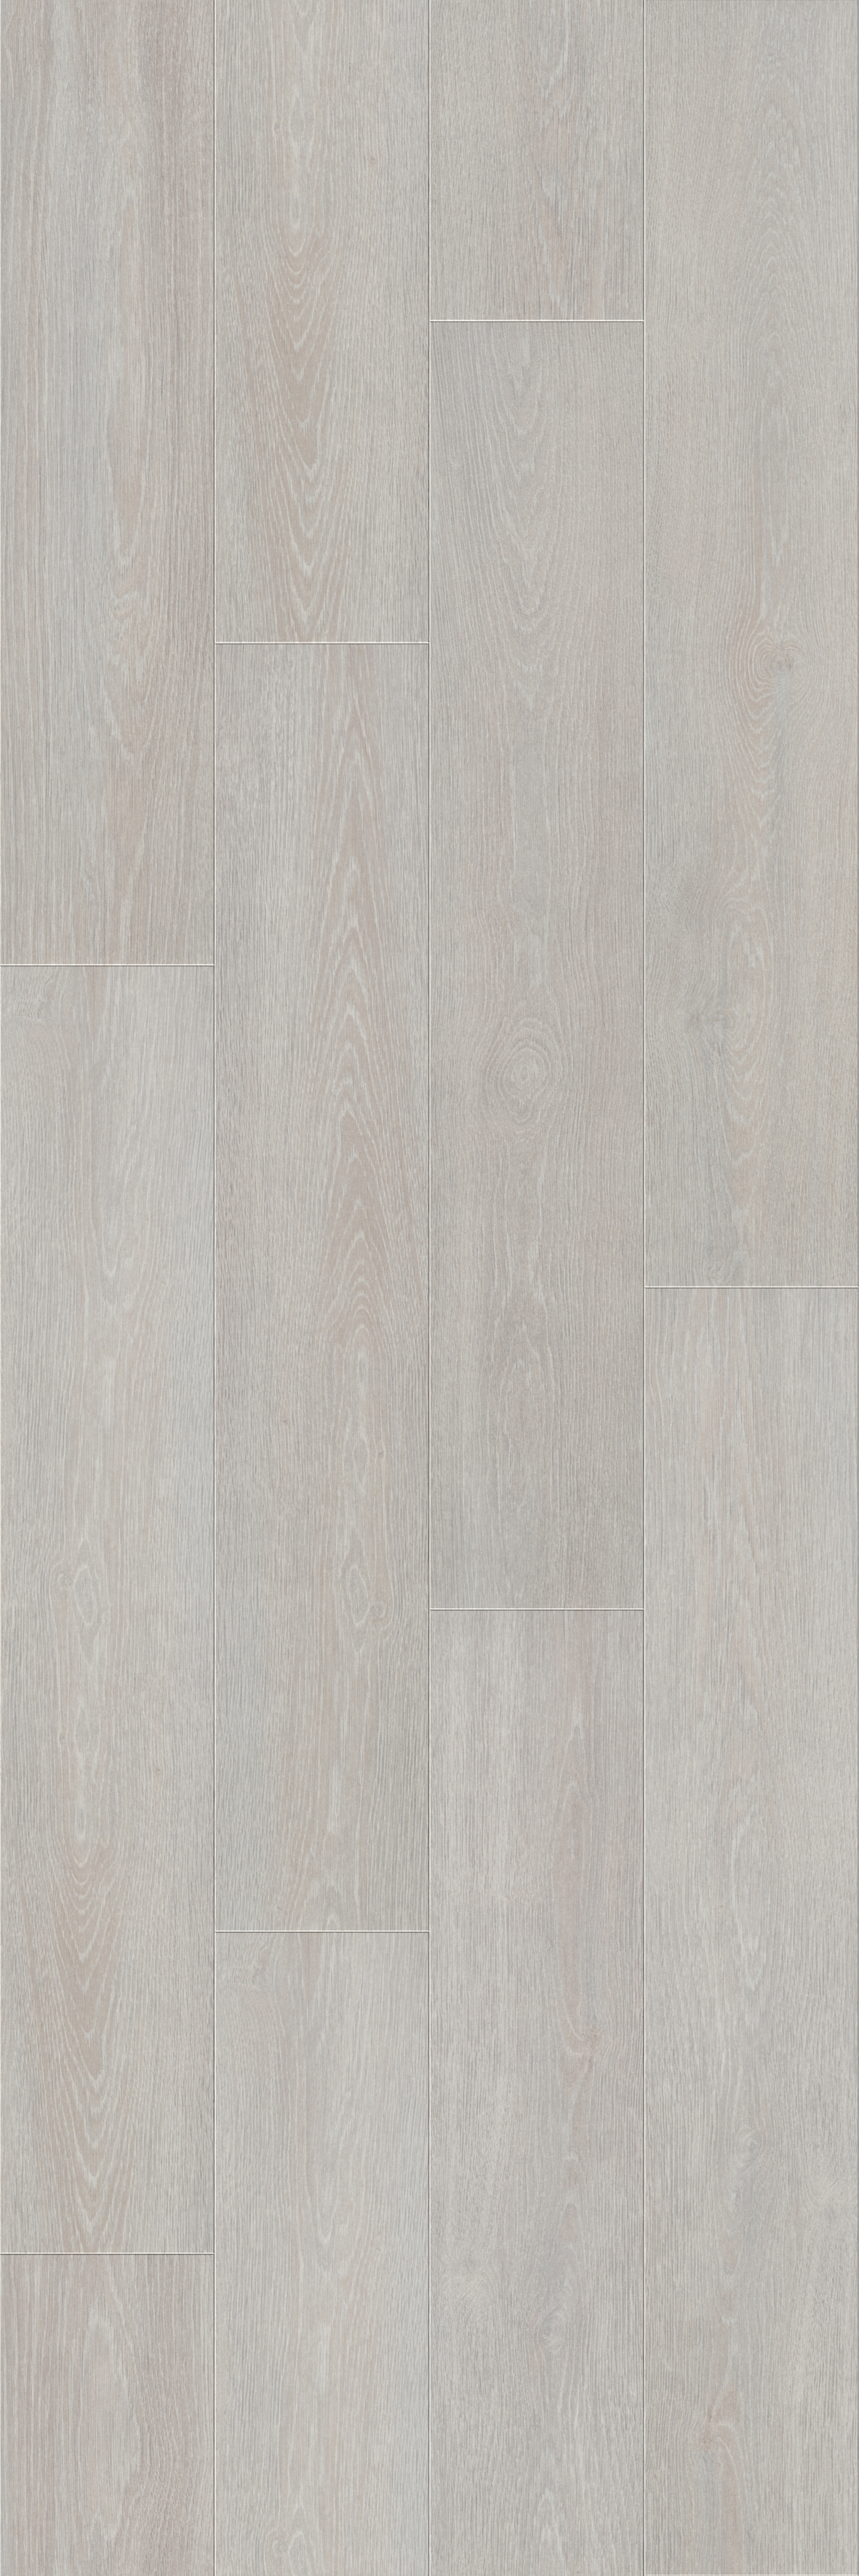 Allura_Wood-w60292_weathered_oak-1